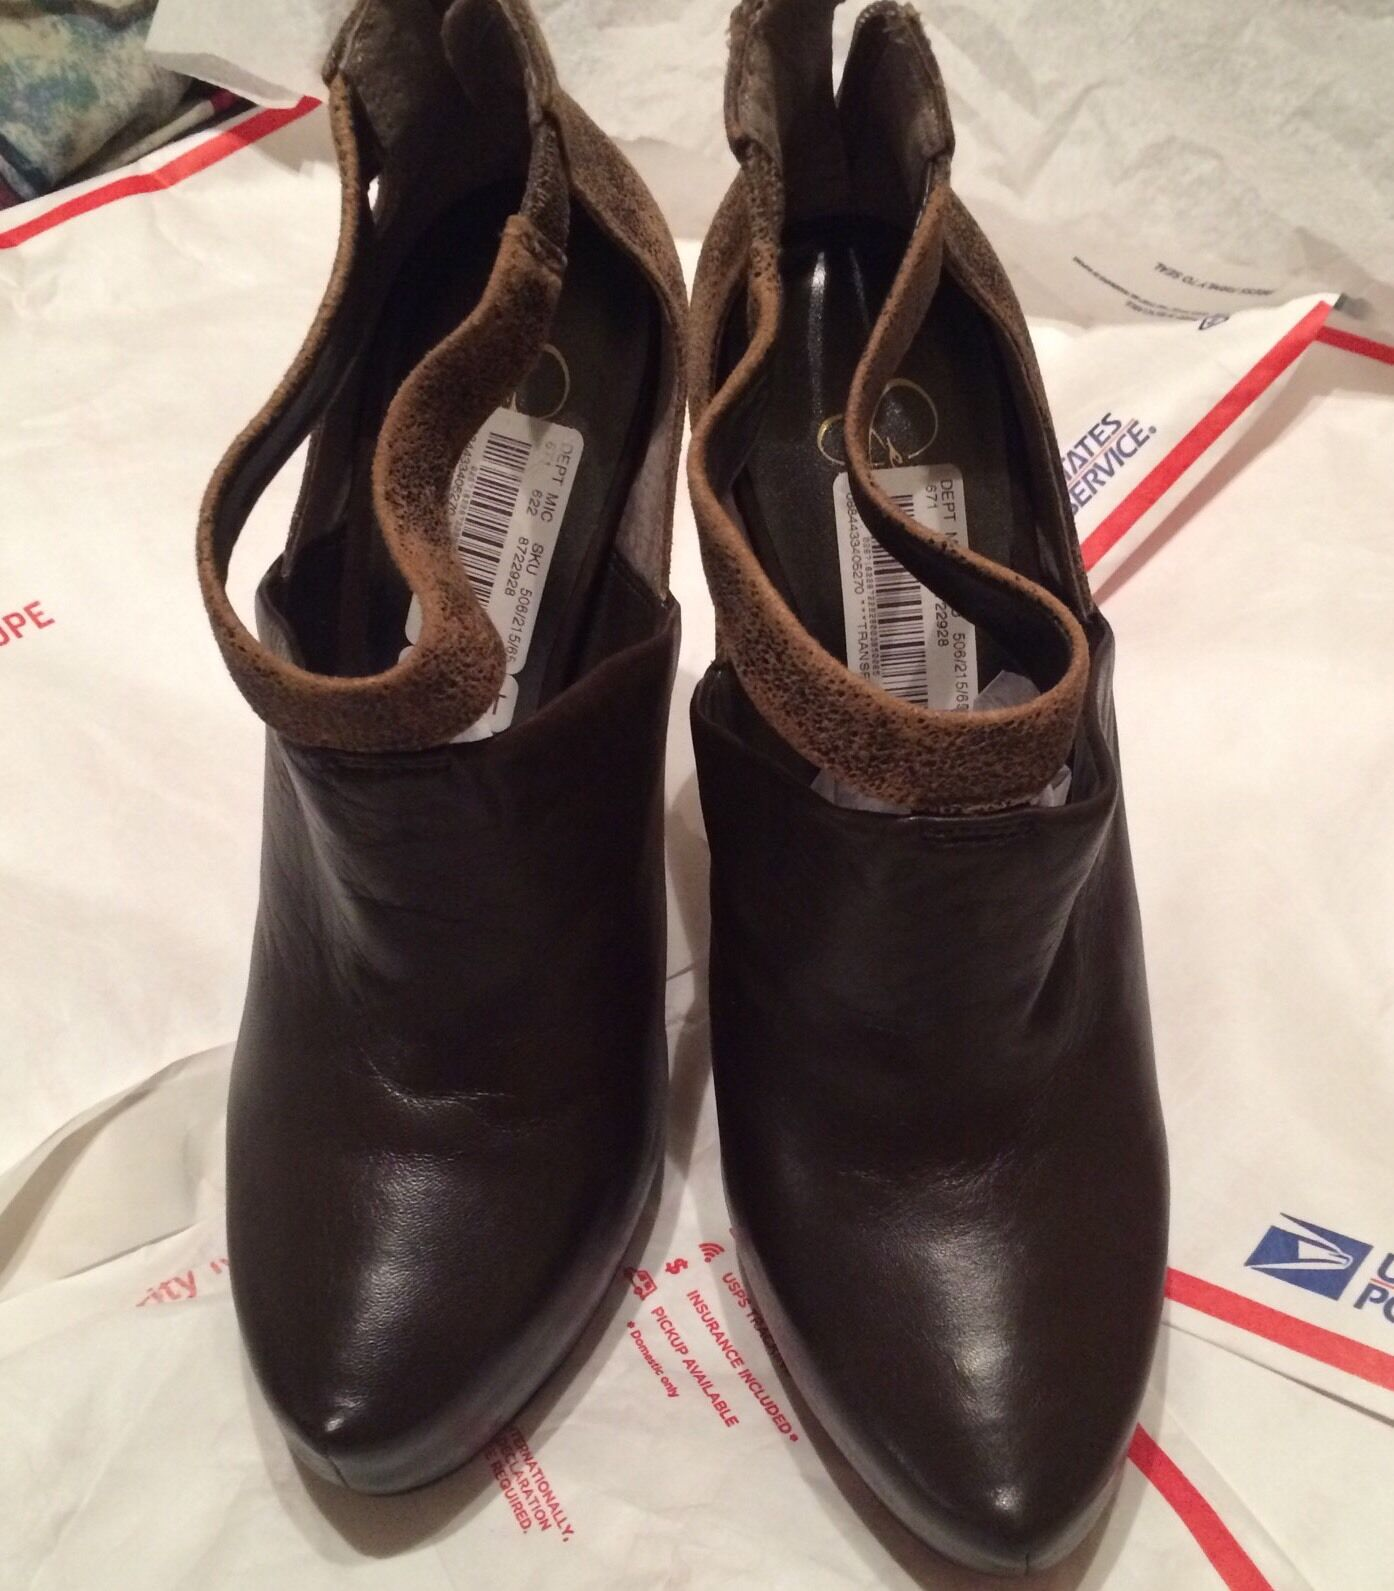 10 New Jessica Simpson Chocolate Leather  Platform  shoes